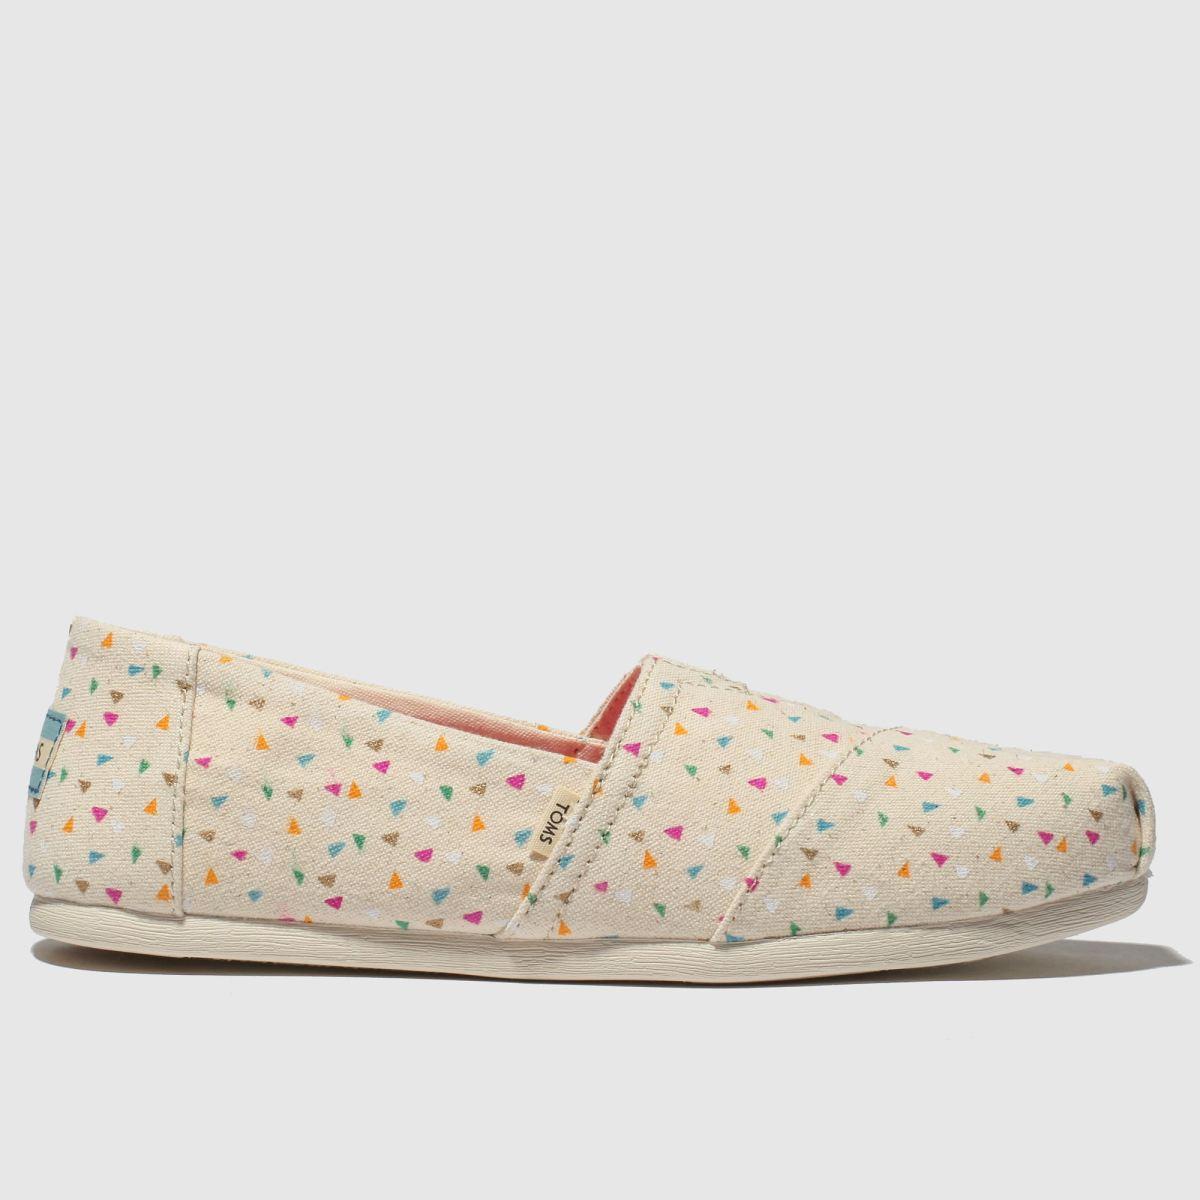 Toms Multi Alpargata Flat Shoes